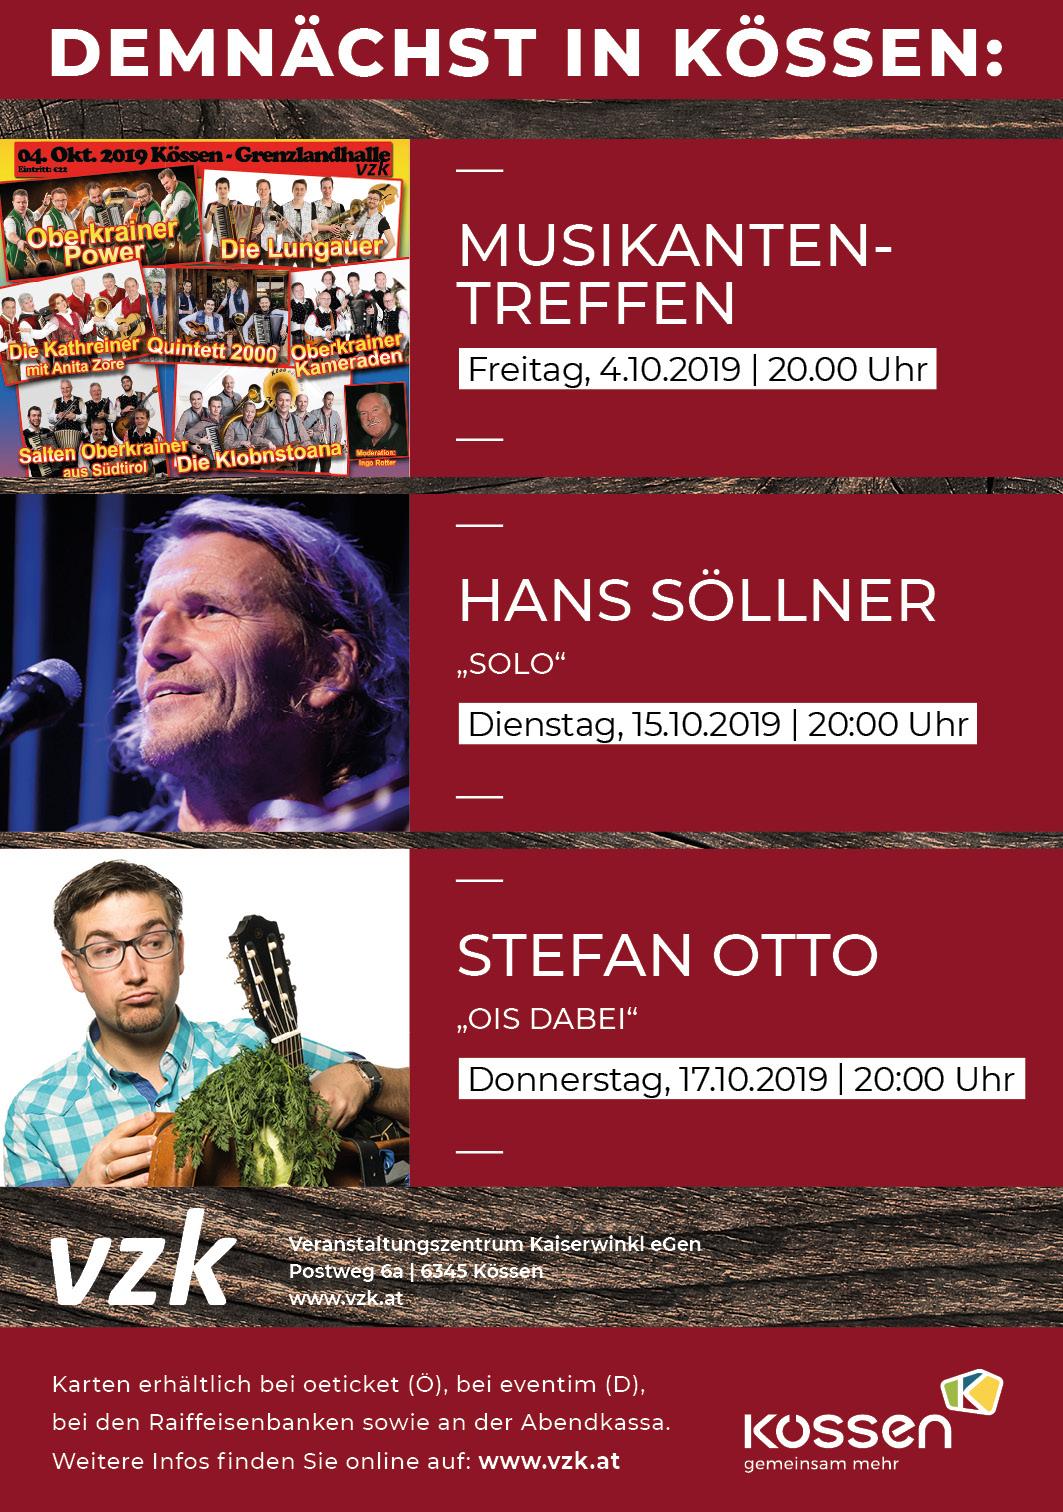 VZK 2019 08 Musikantentreffen-Söllner-Otto 90x128mm